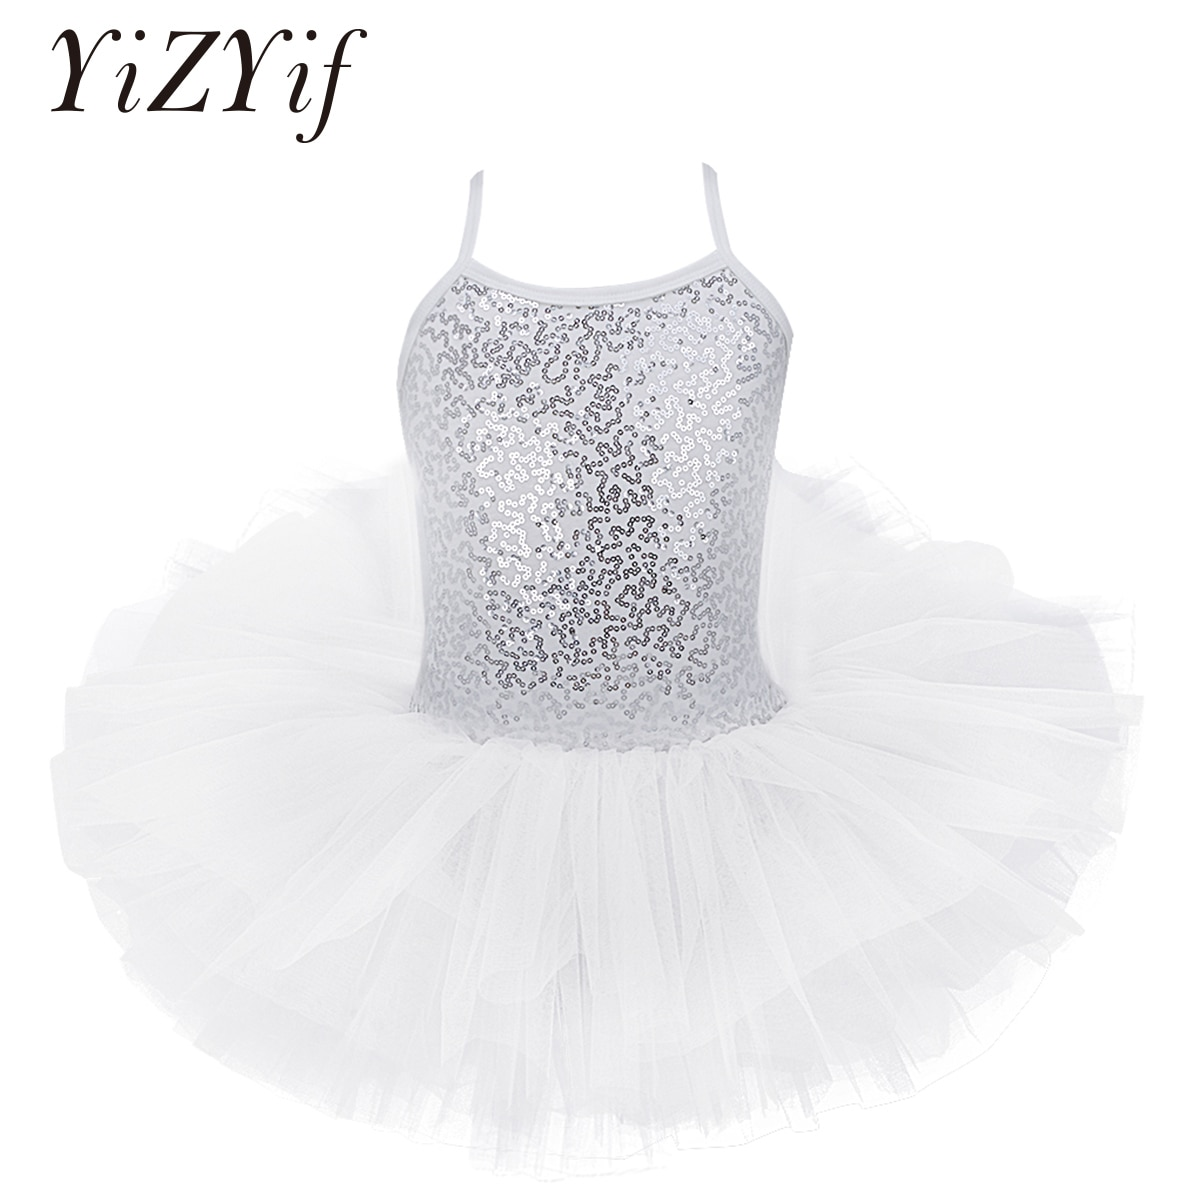 Kid Girls Ballet Tutu Tulle Dress Sleeveless Gymnastics Leotard Sequin Criss-Cross Ballet Leotard For Girl Ballerina Performance